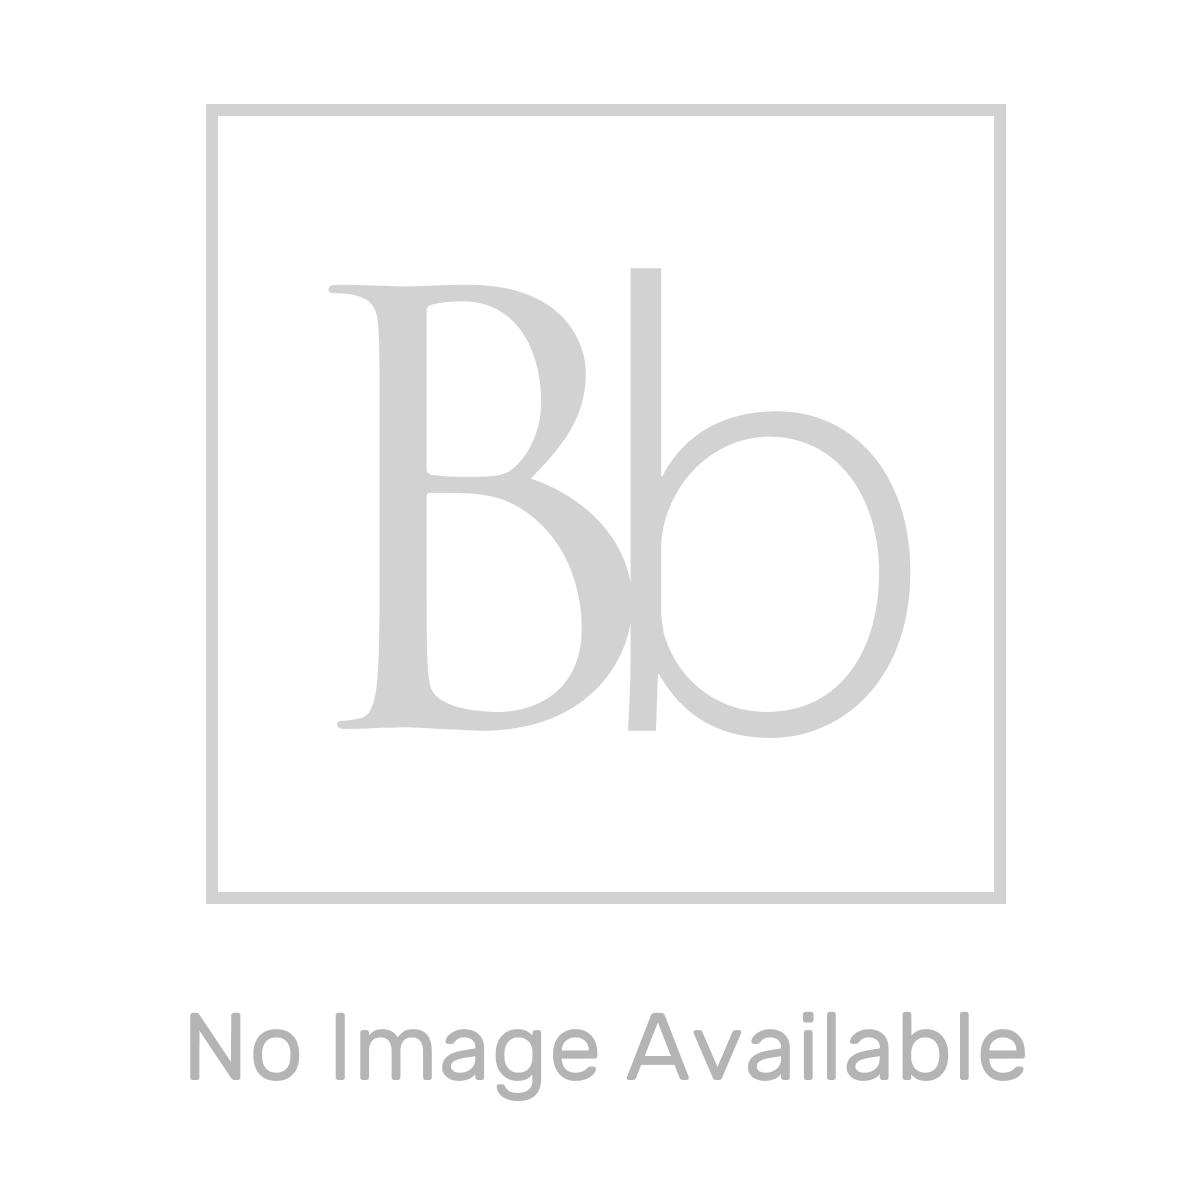 Bathrooms To Love RefleXion Flex Pivot Shower Door with Optional Side Panel 1